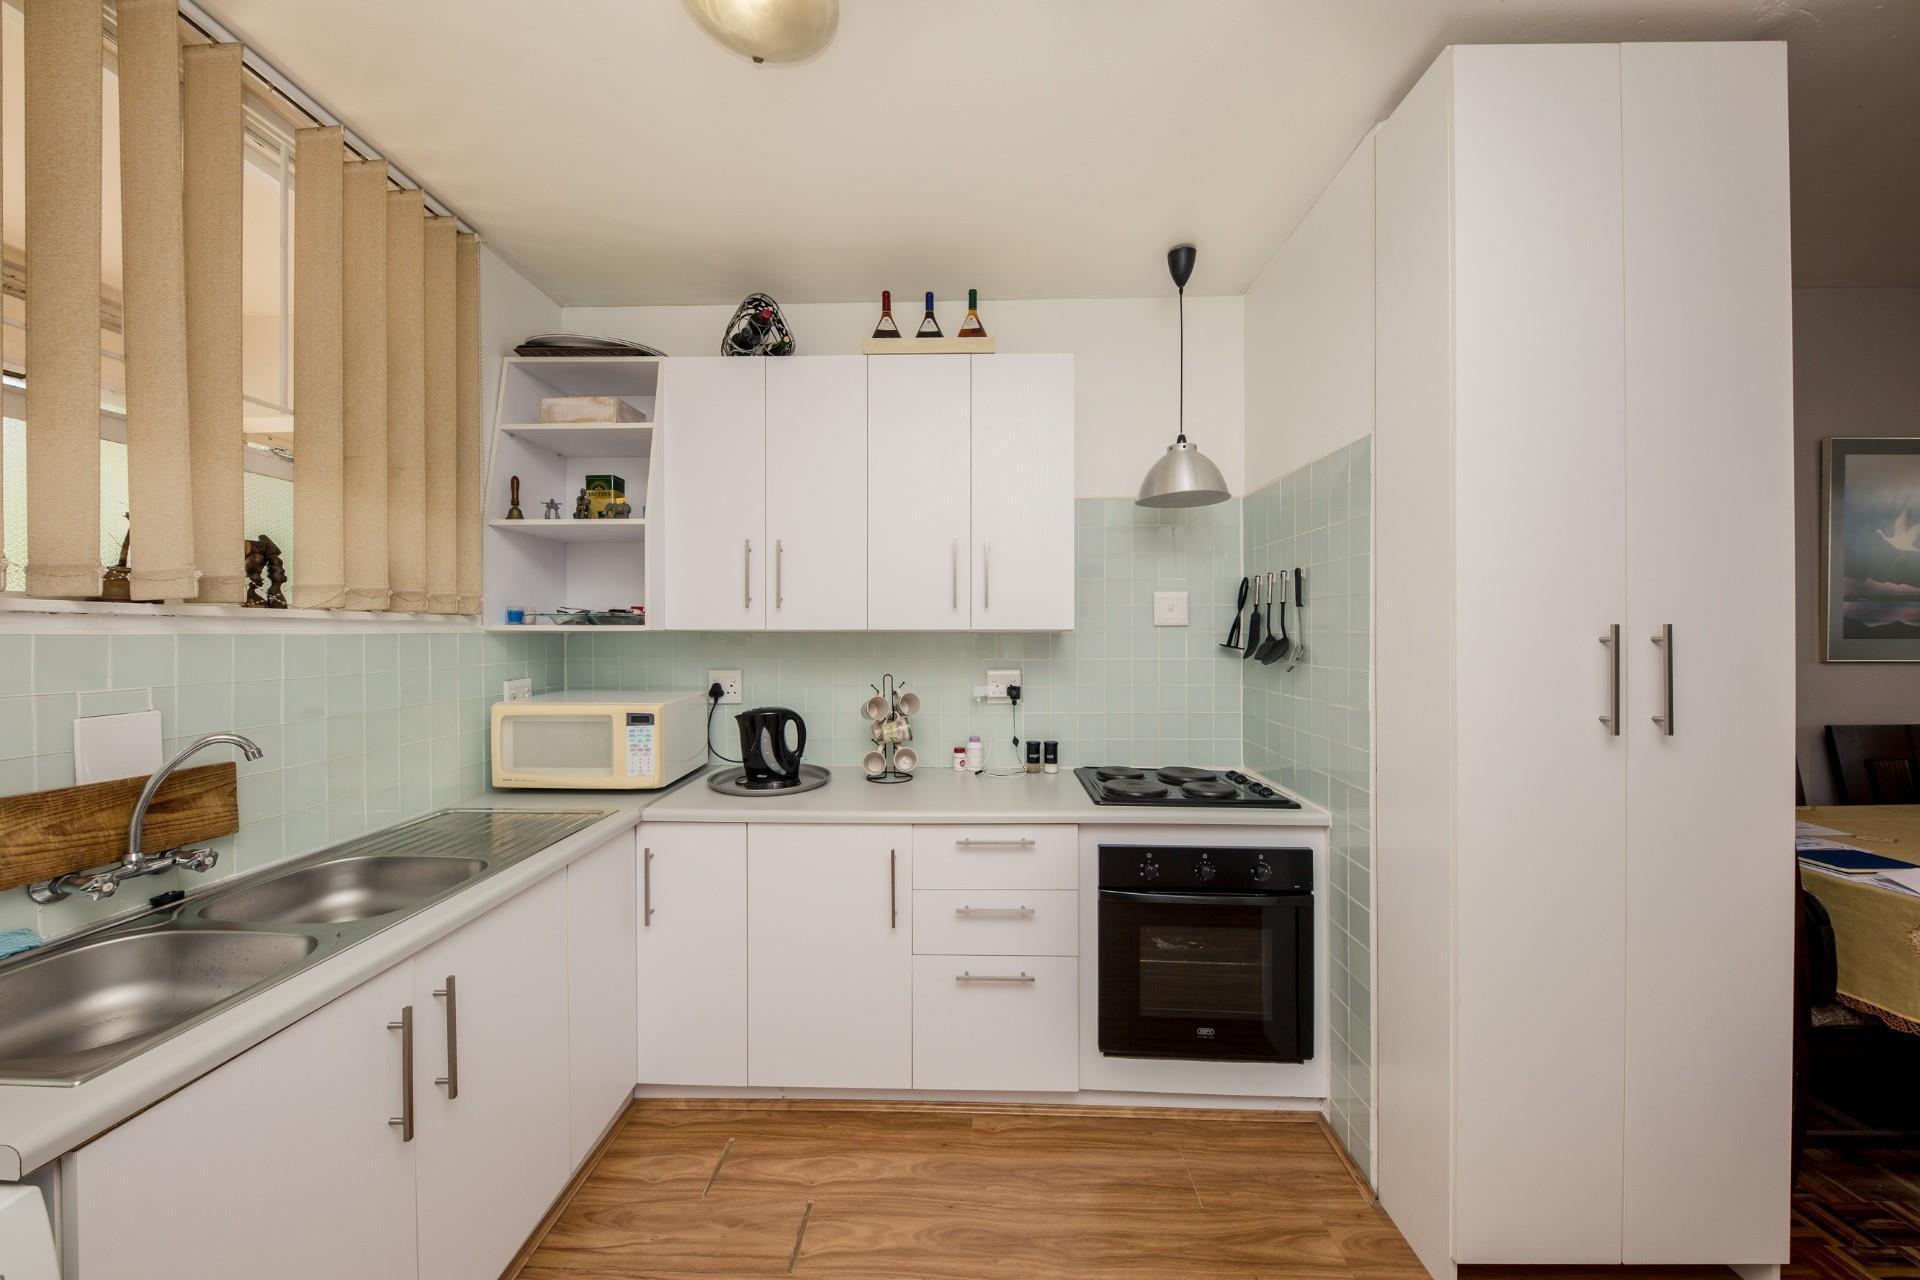 2 Bedroom Apartment / Flat For Sale in Loevenstein